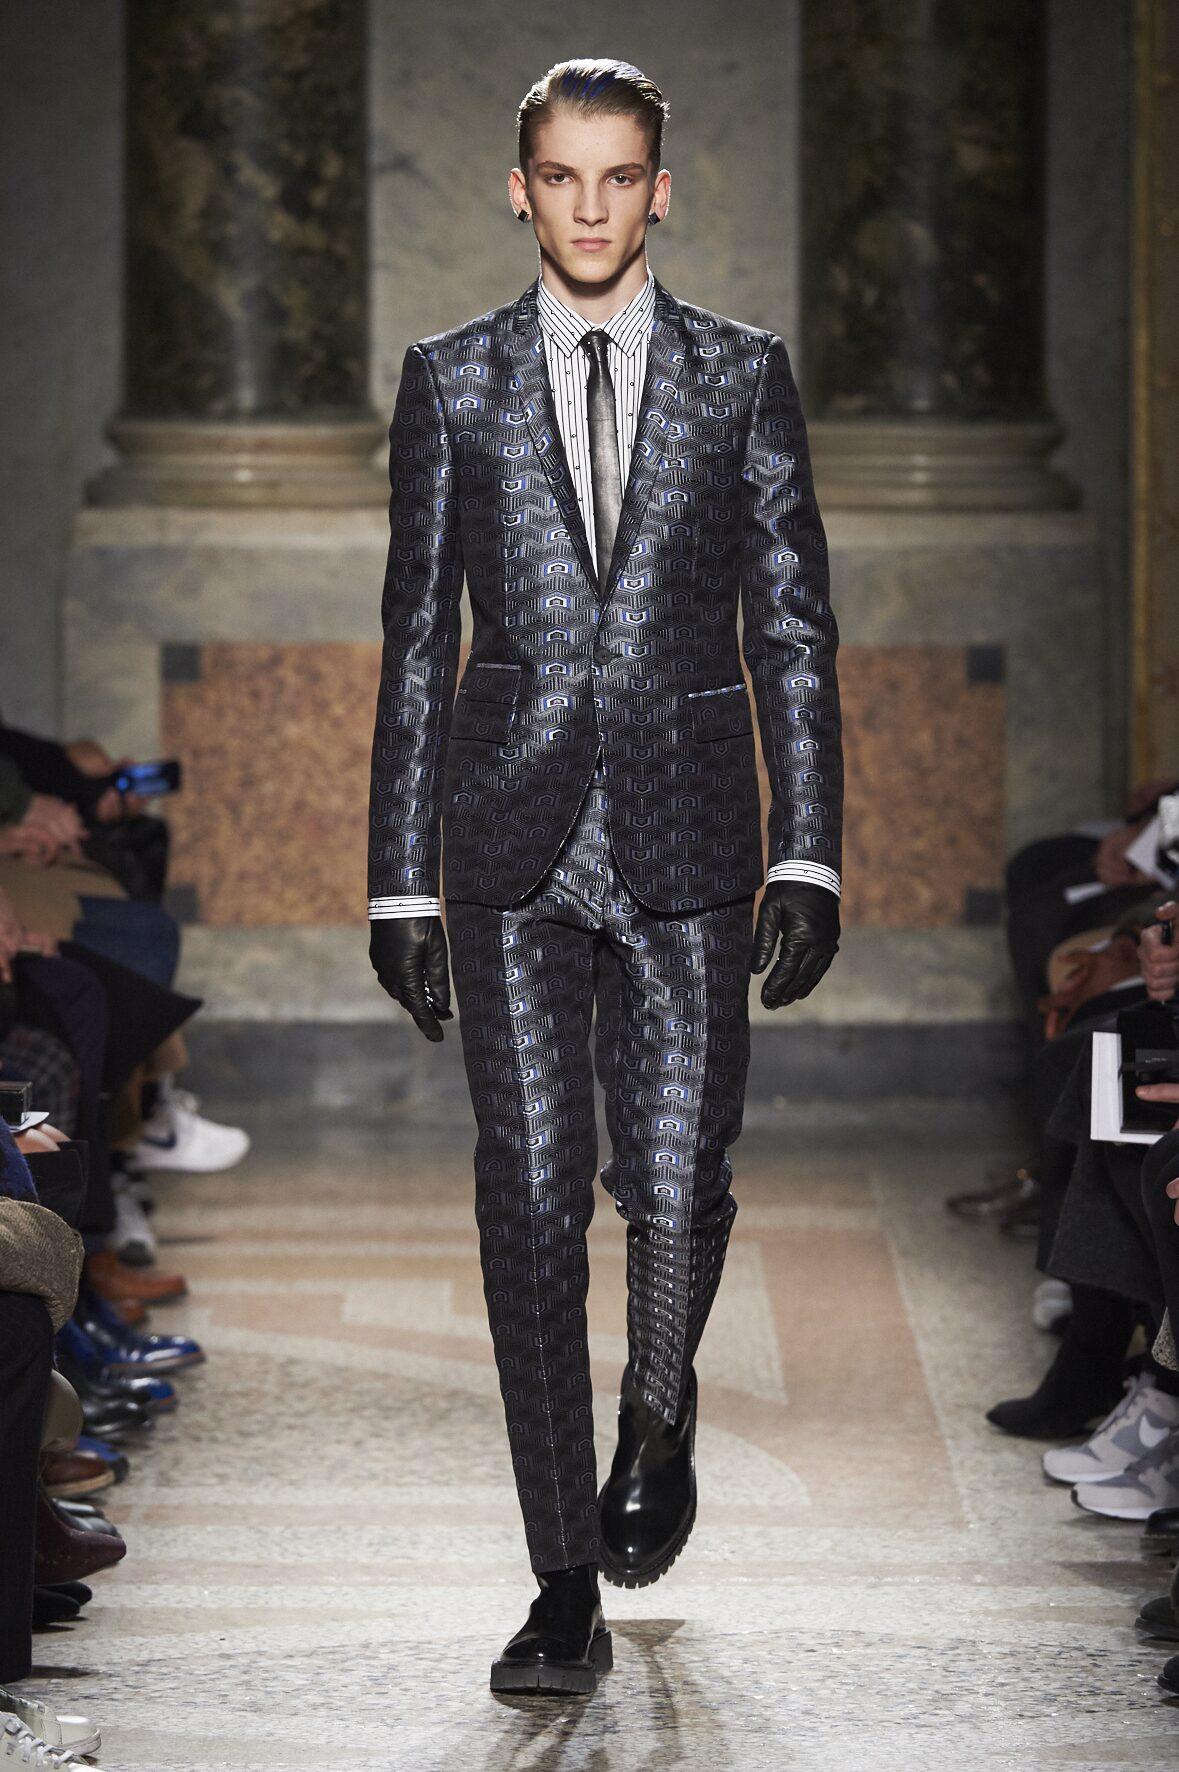 Les Hommes FW 2016 Menswear